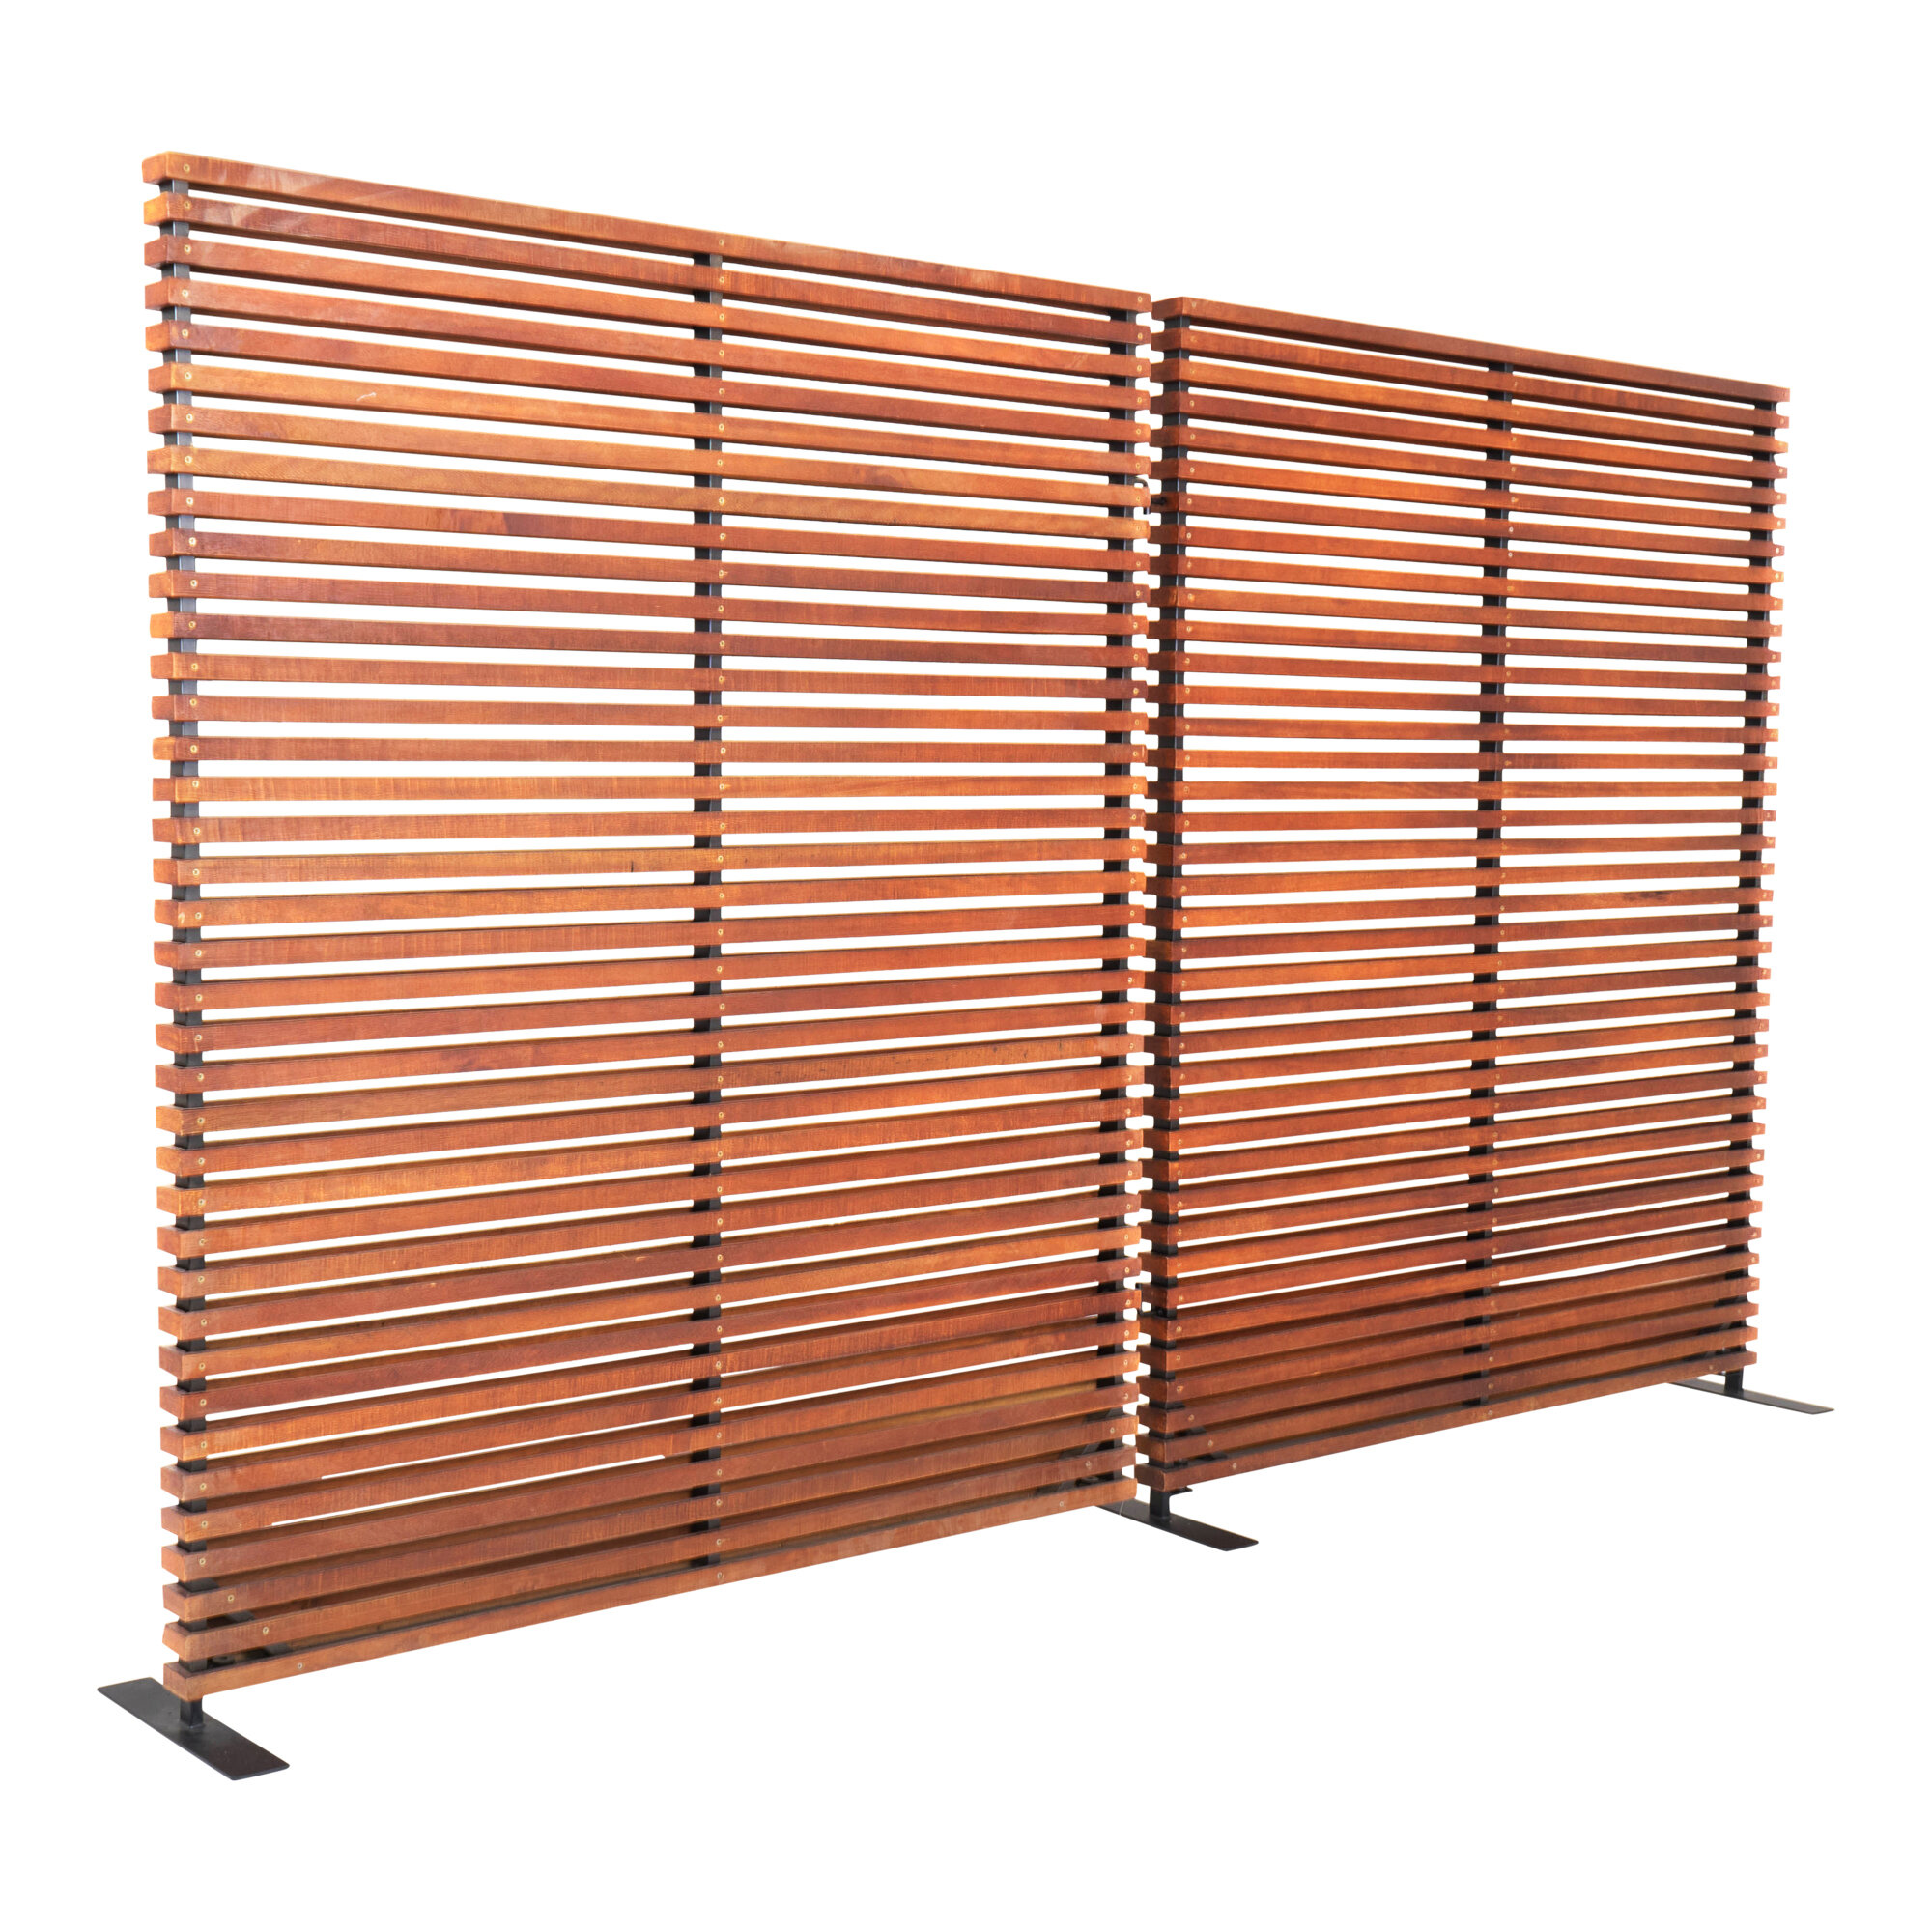 Union Rustic Shiela 2 Panel Room Divider Reviews Wayfair